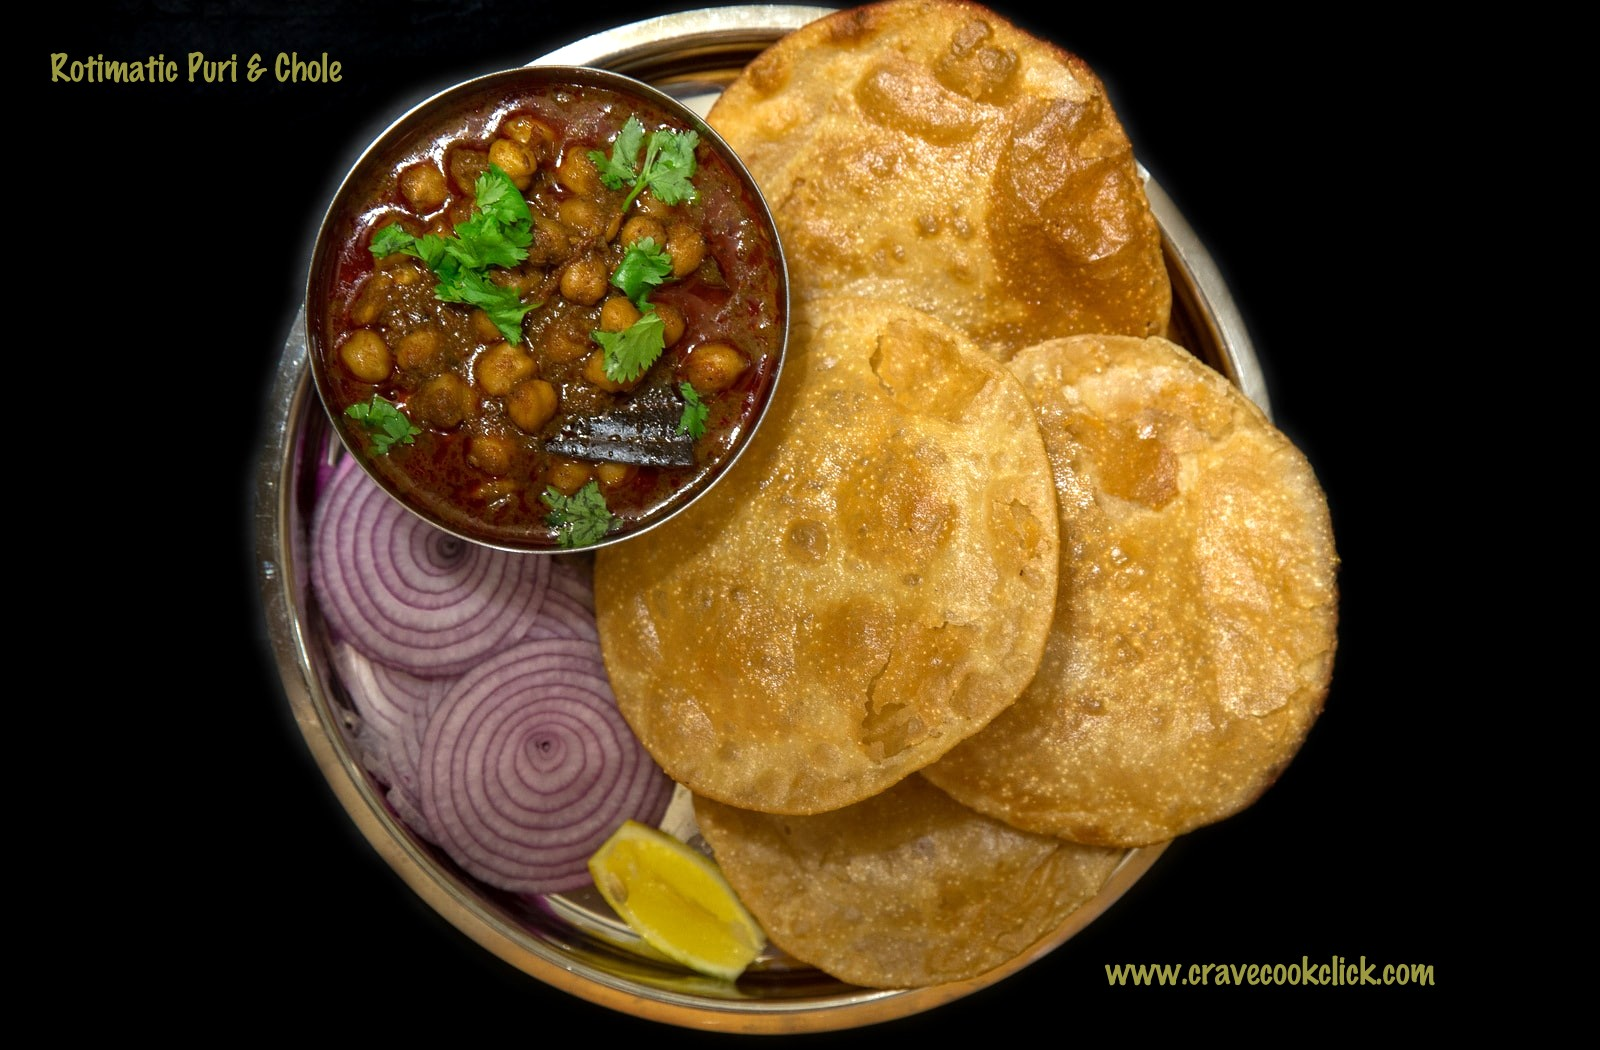 Rotimatic Puri & Chole Recipe